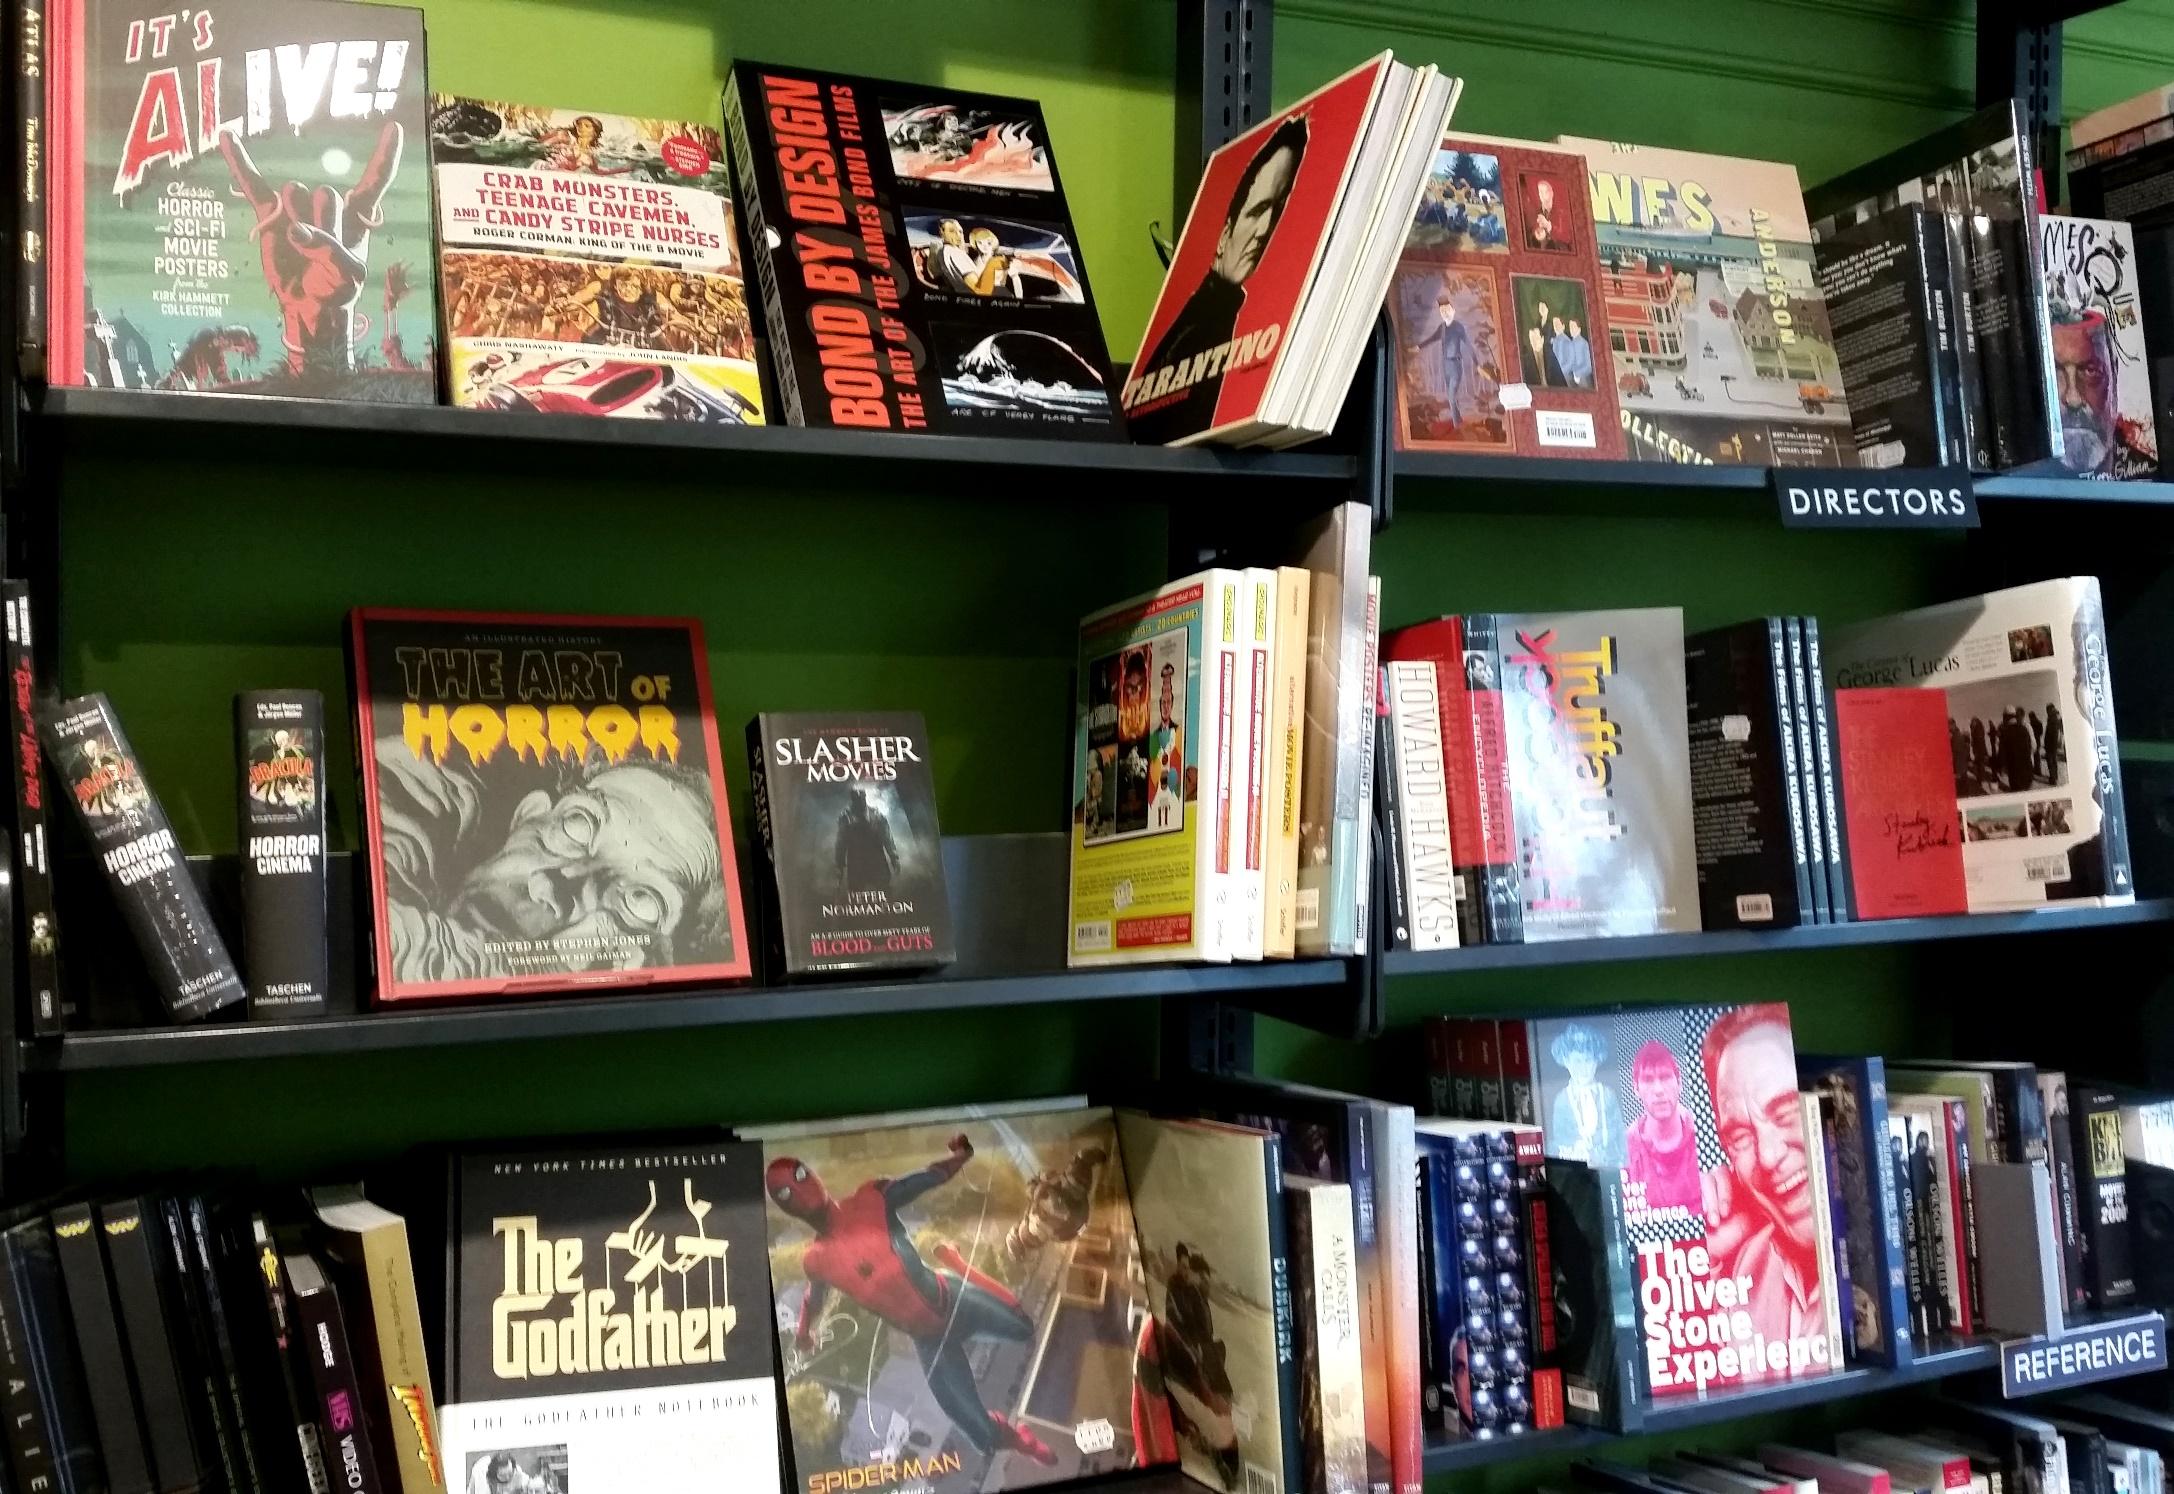 The American Book Center